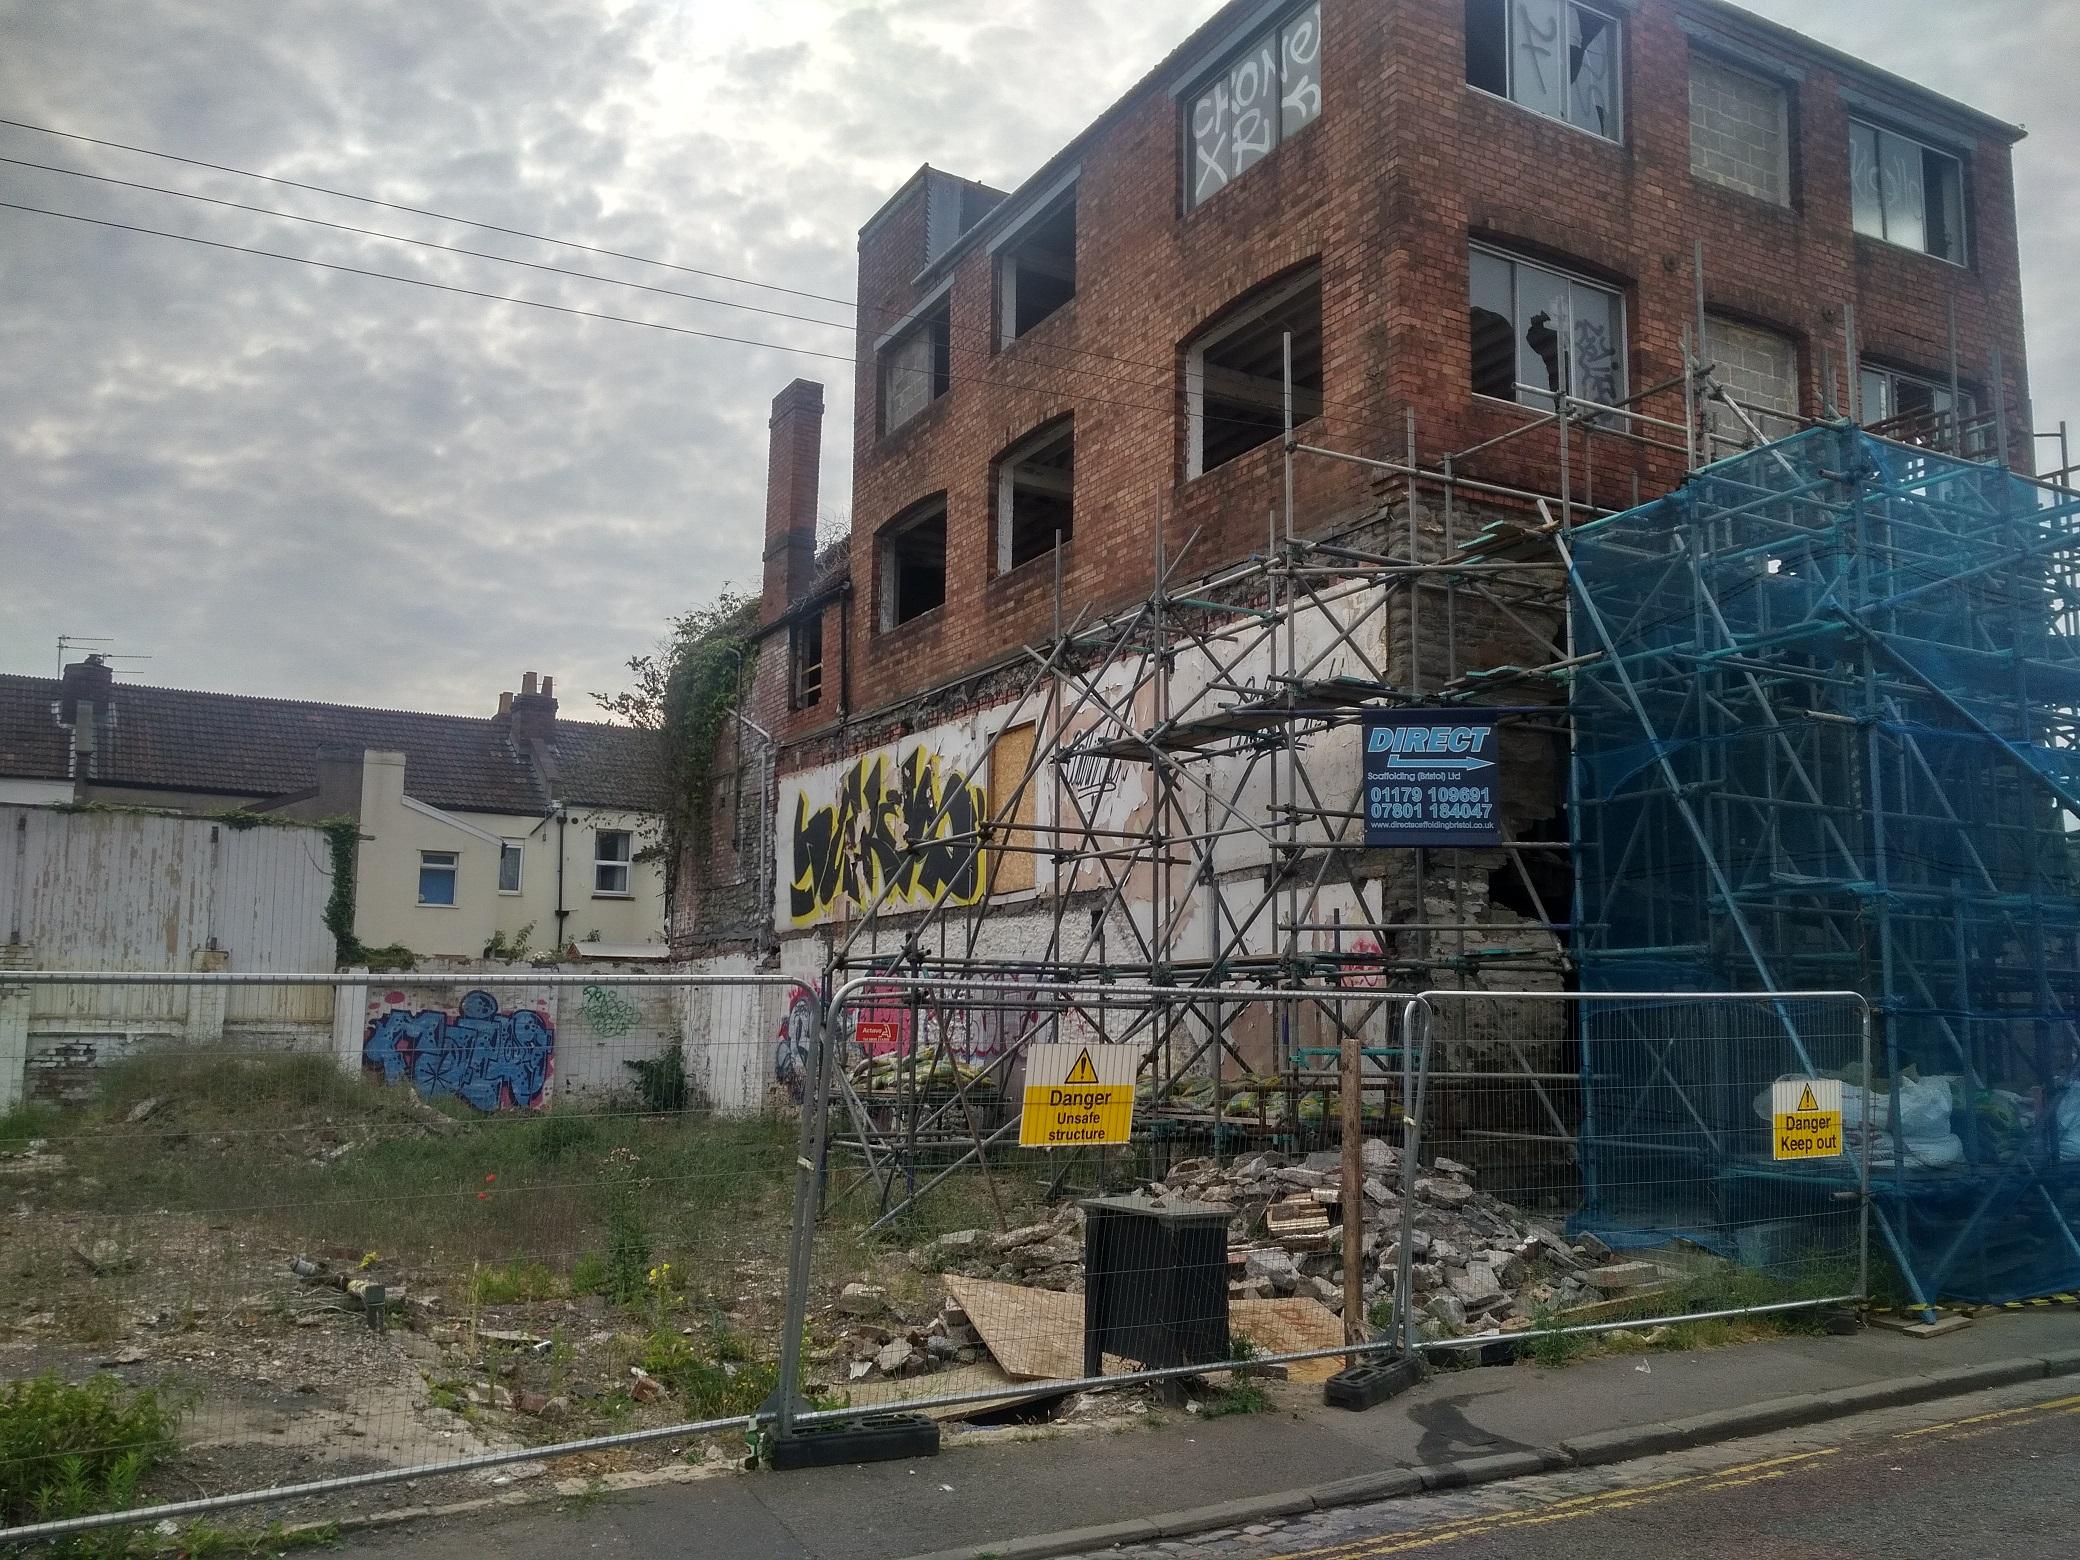 [photo] Lyppiatt Road  development